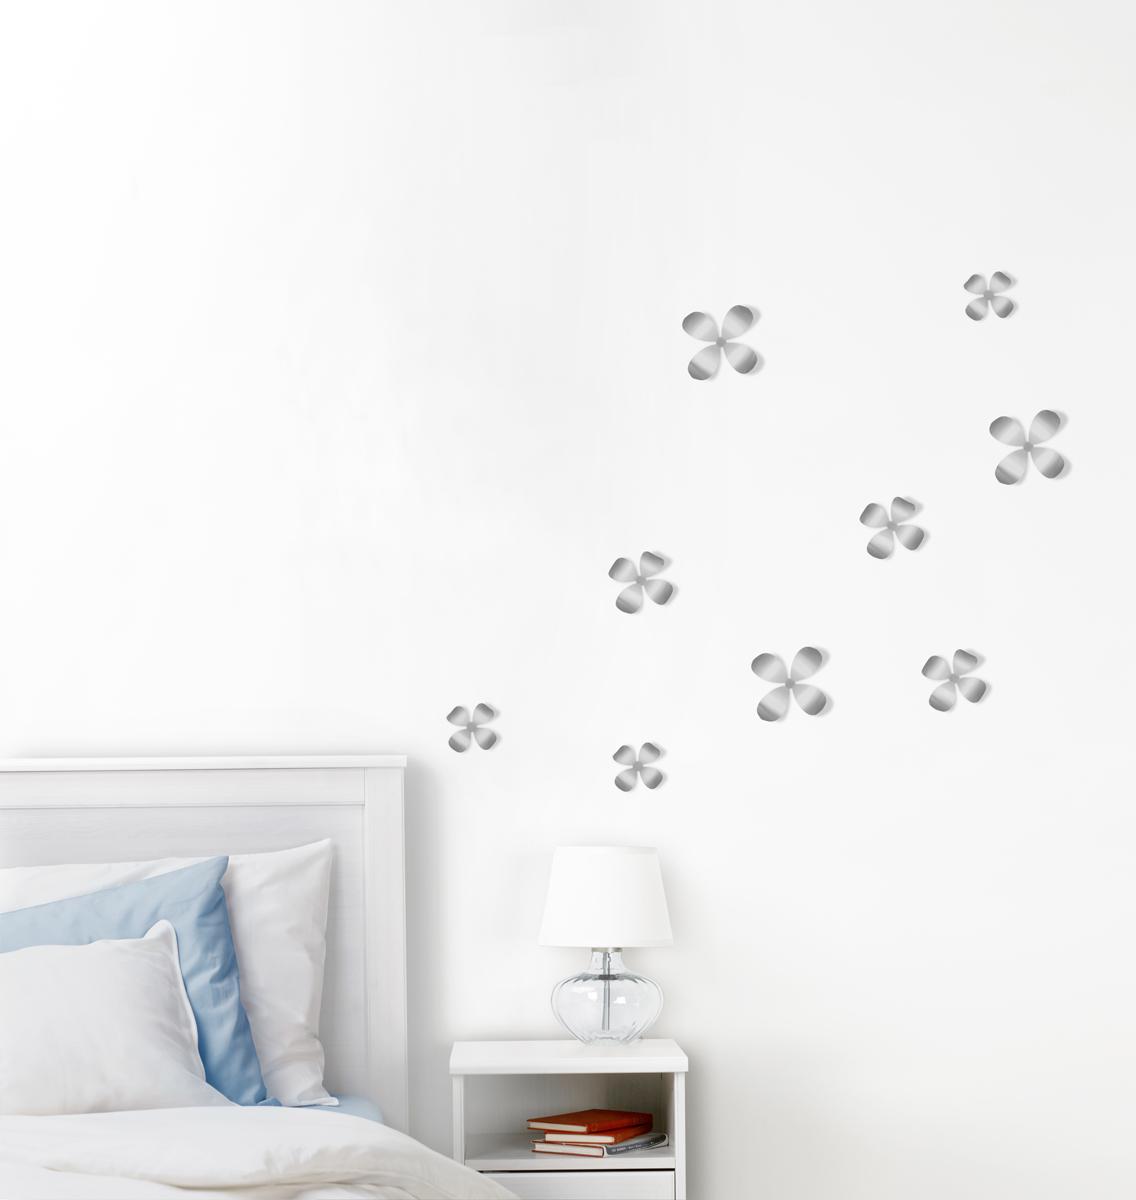 Декор для стен Umbra Wallflower, цвет: никель, 9 элементов стакан для ванной umbra droplet цвет дымчатый 9 3 х 9 6 х 9 6 см